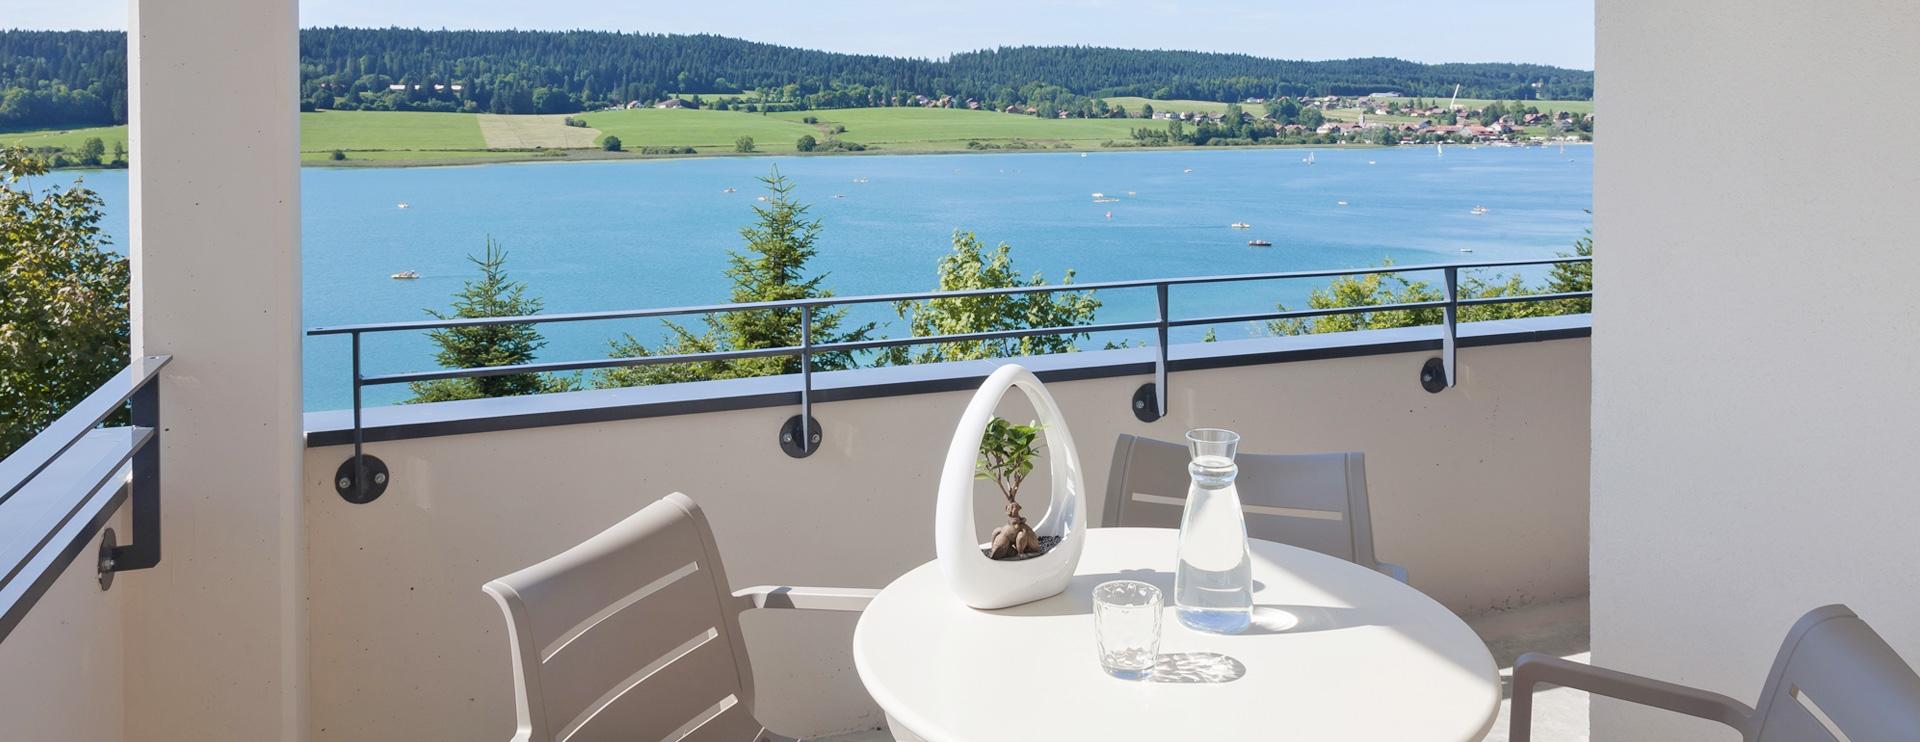 Balcon hôtel spa Haut-Doubs